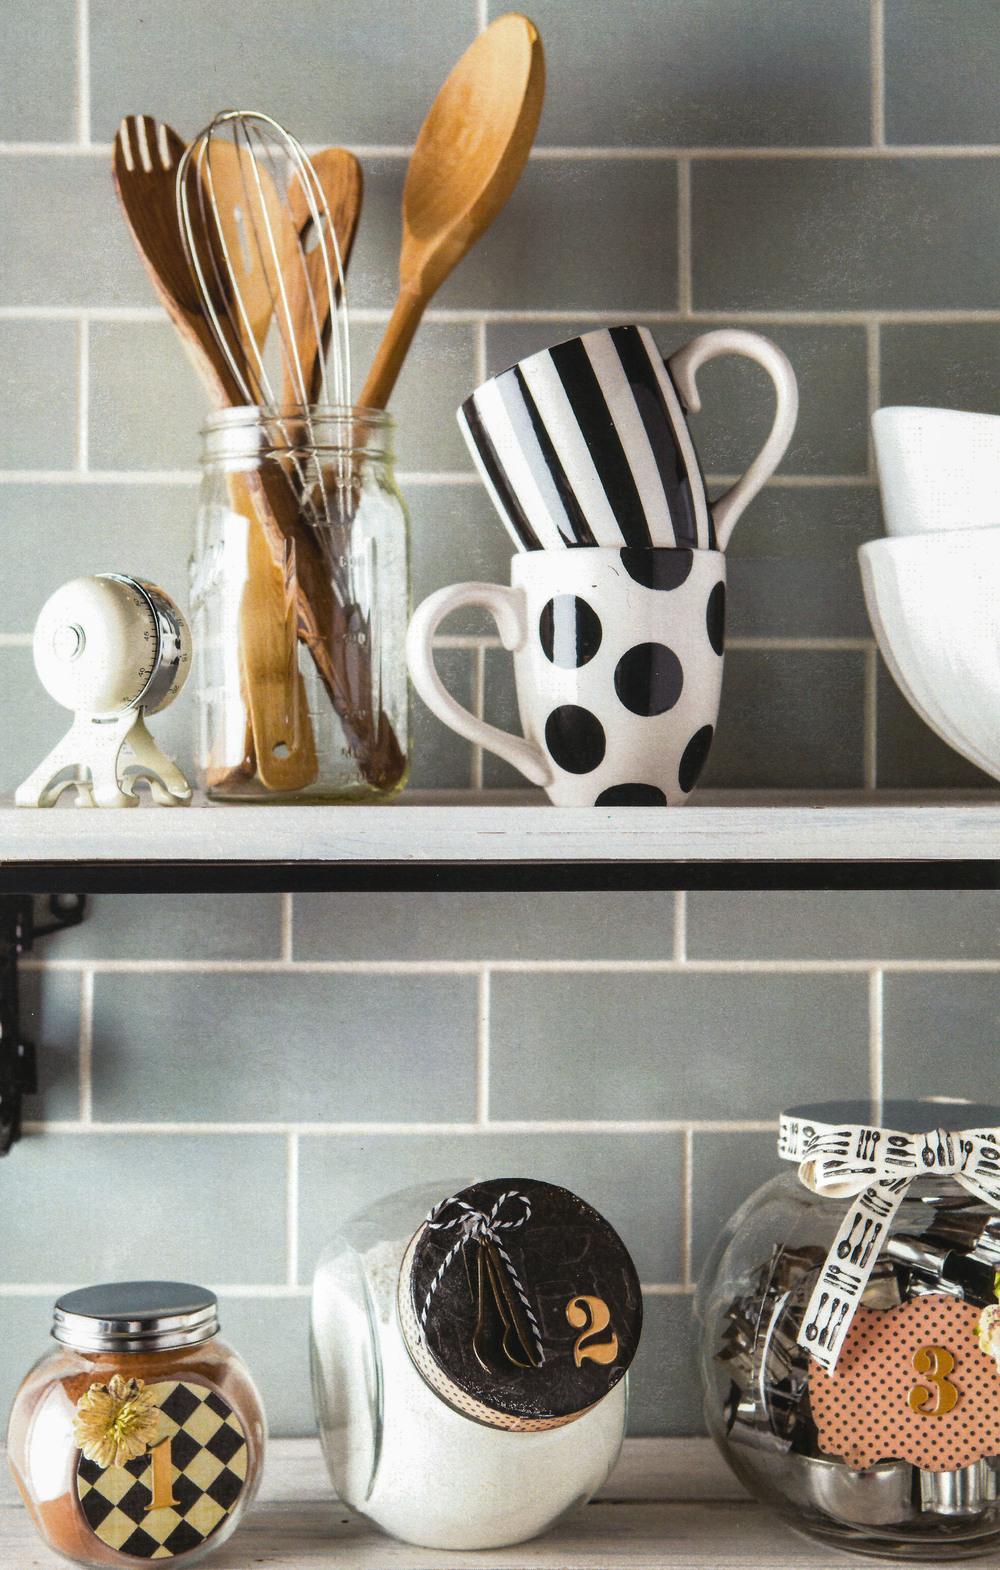 kitchenset.jpg